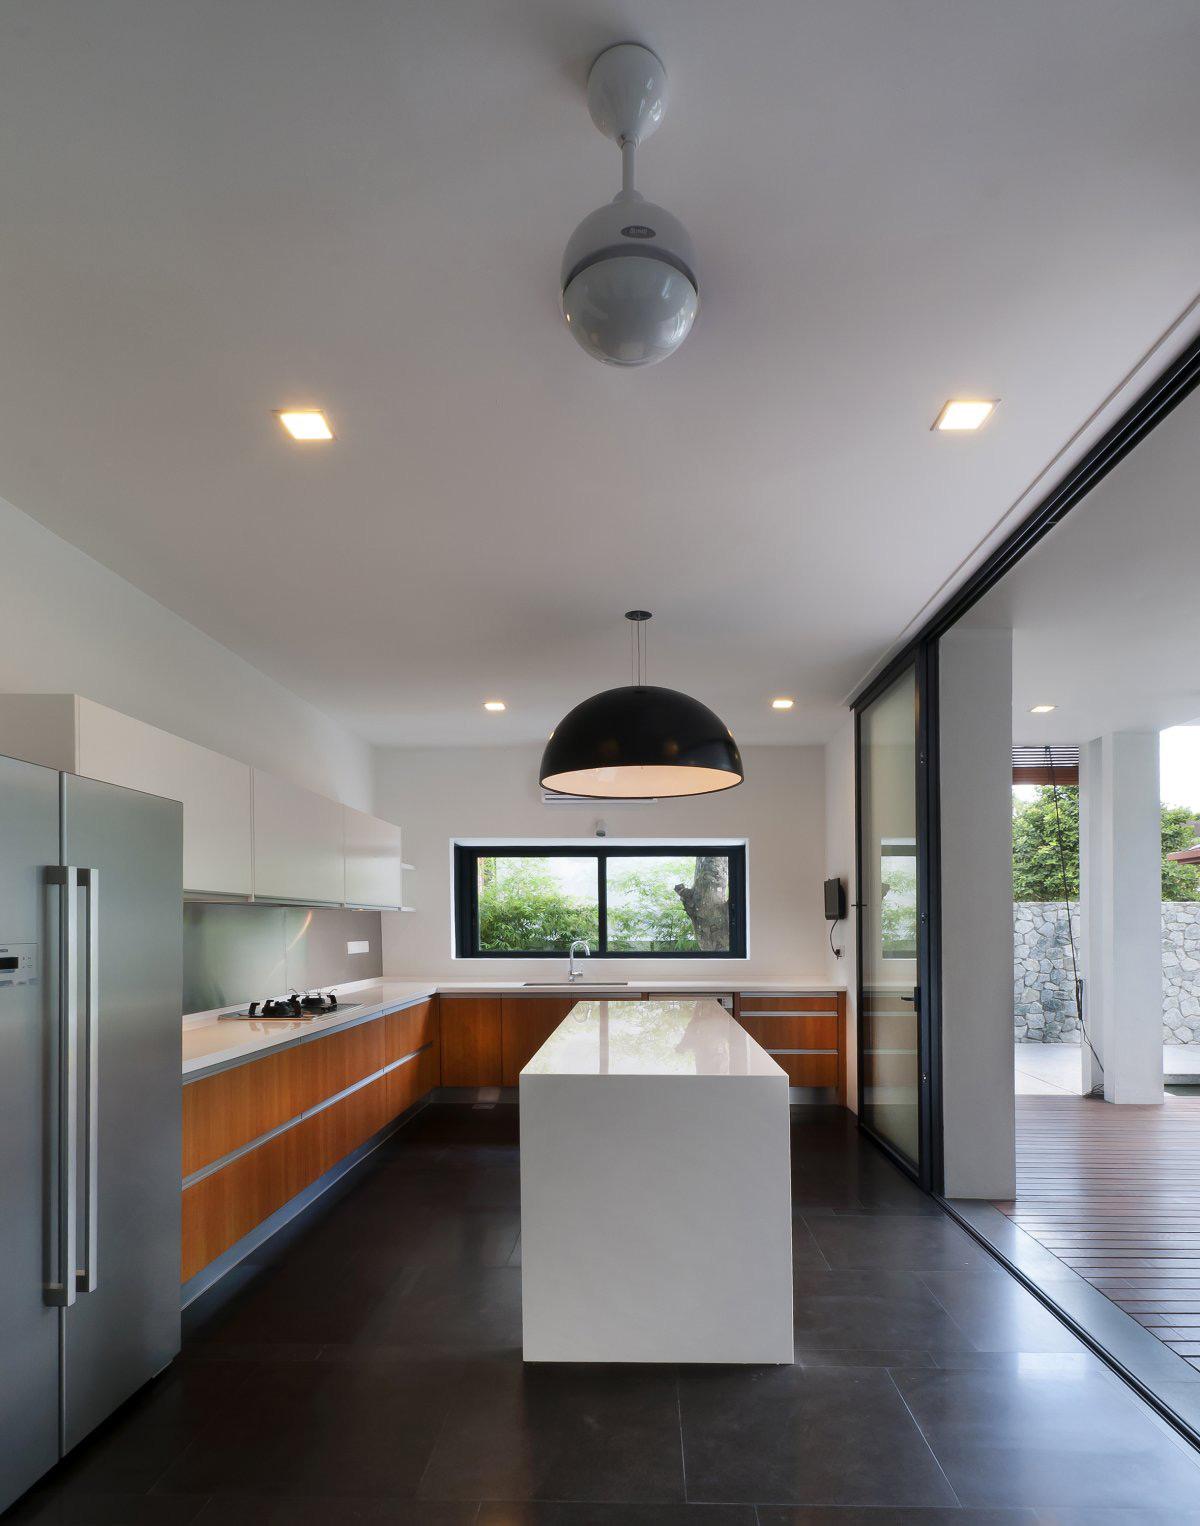 Kitchen, White Island, Dark Tiles, Modern Home in Kuala Lumpur